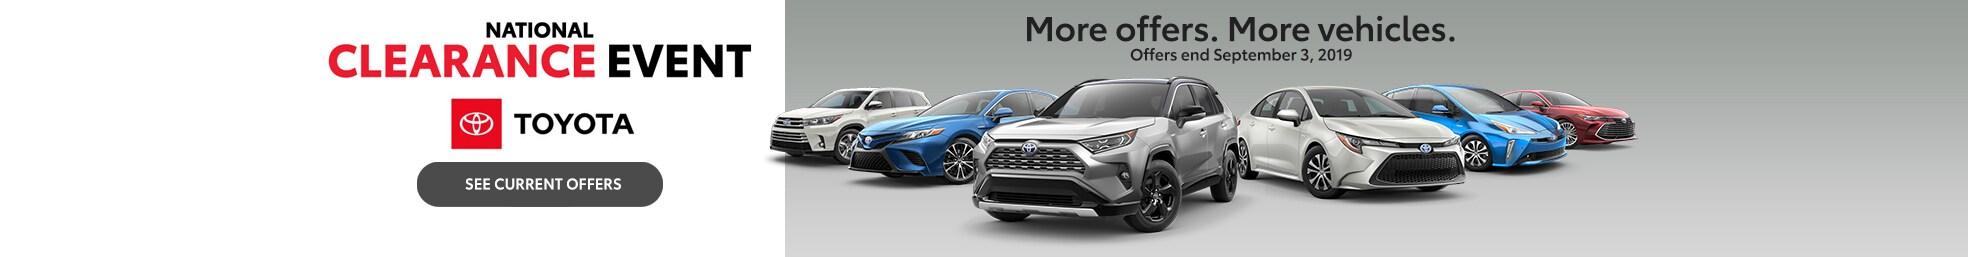 Performance Toyota Omaha >> Omaha Toyota Dealership New Used Cars In Omaha Near Lincoln Ne